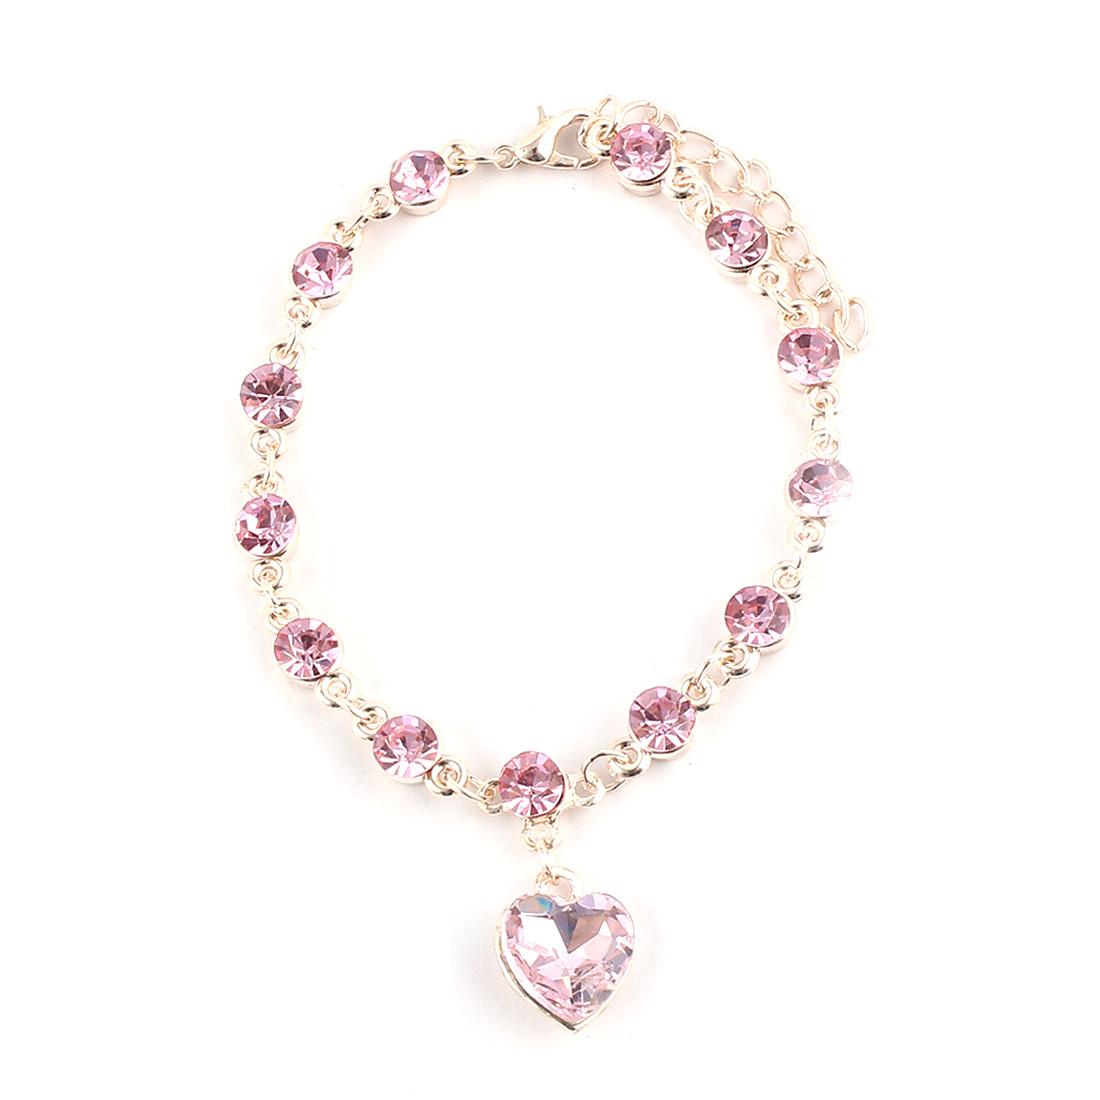 Plastic Heart Design Decor Jewelry Wrist Chain Bangle Bracelet Pink Rose Gold